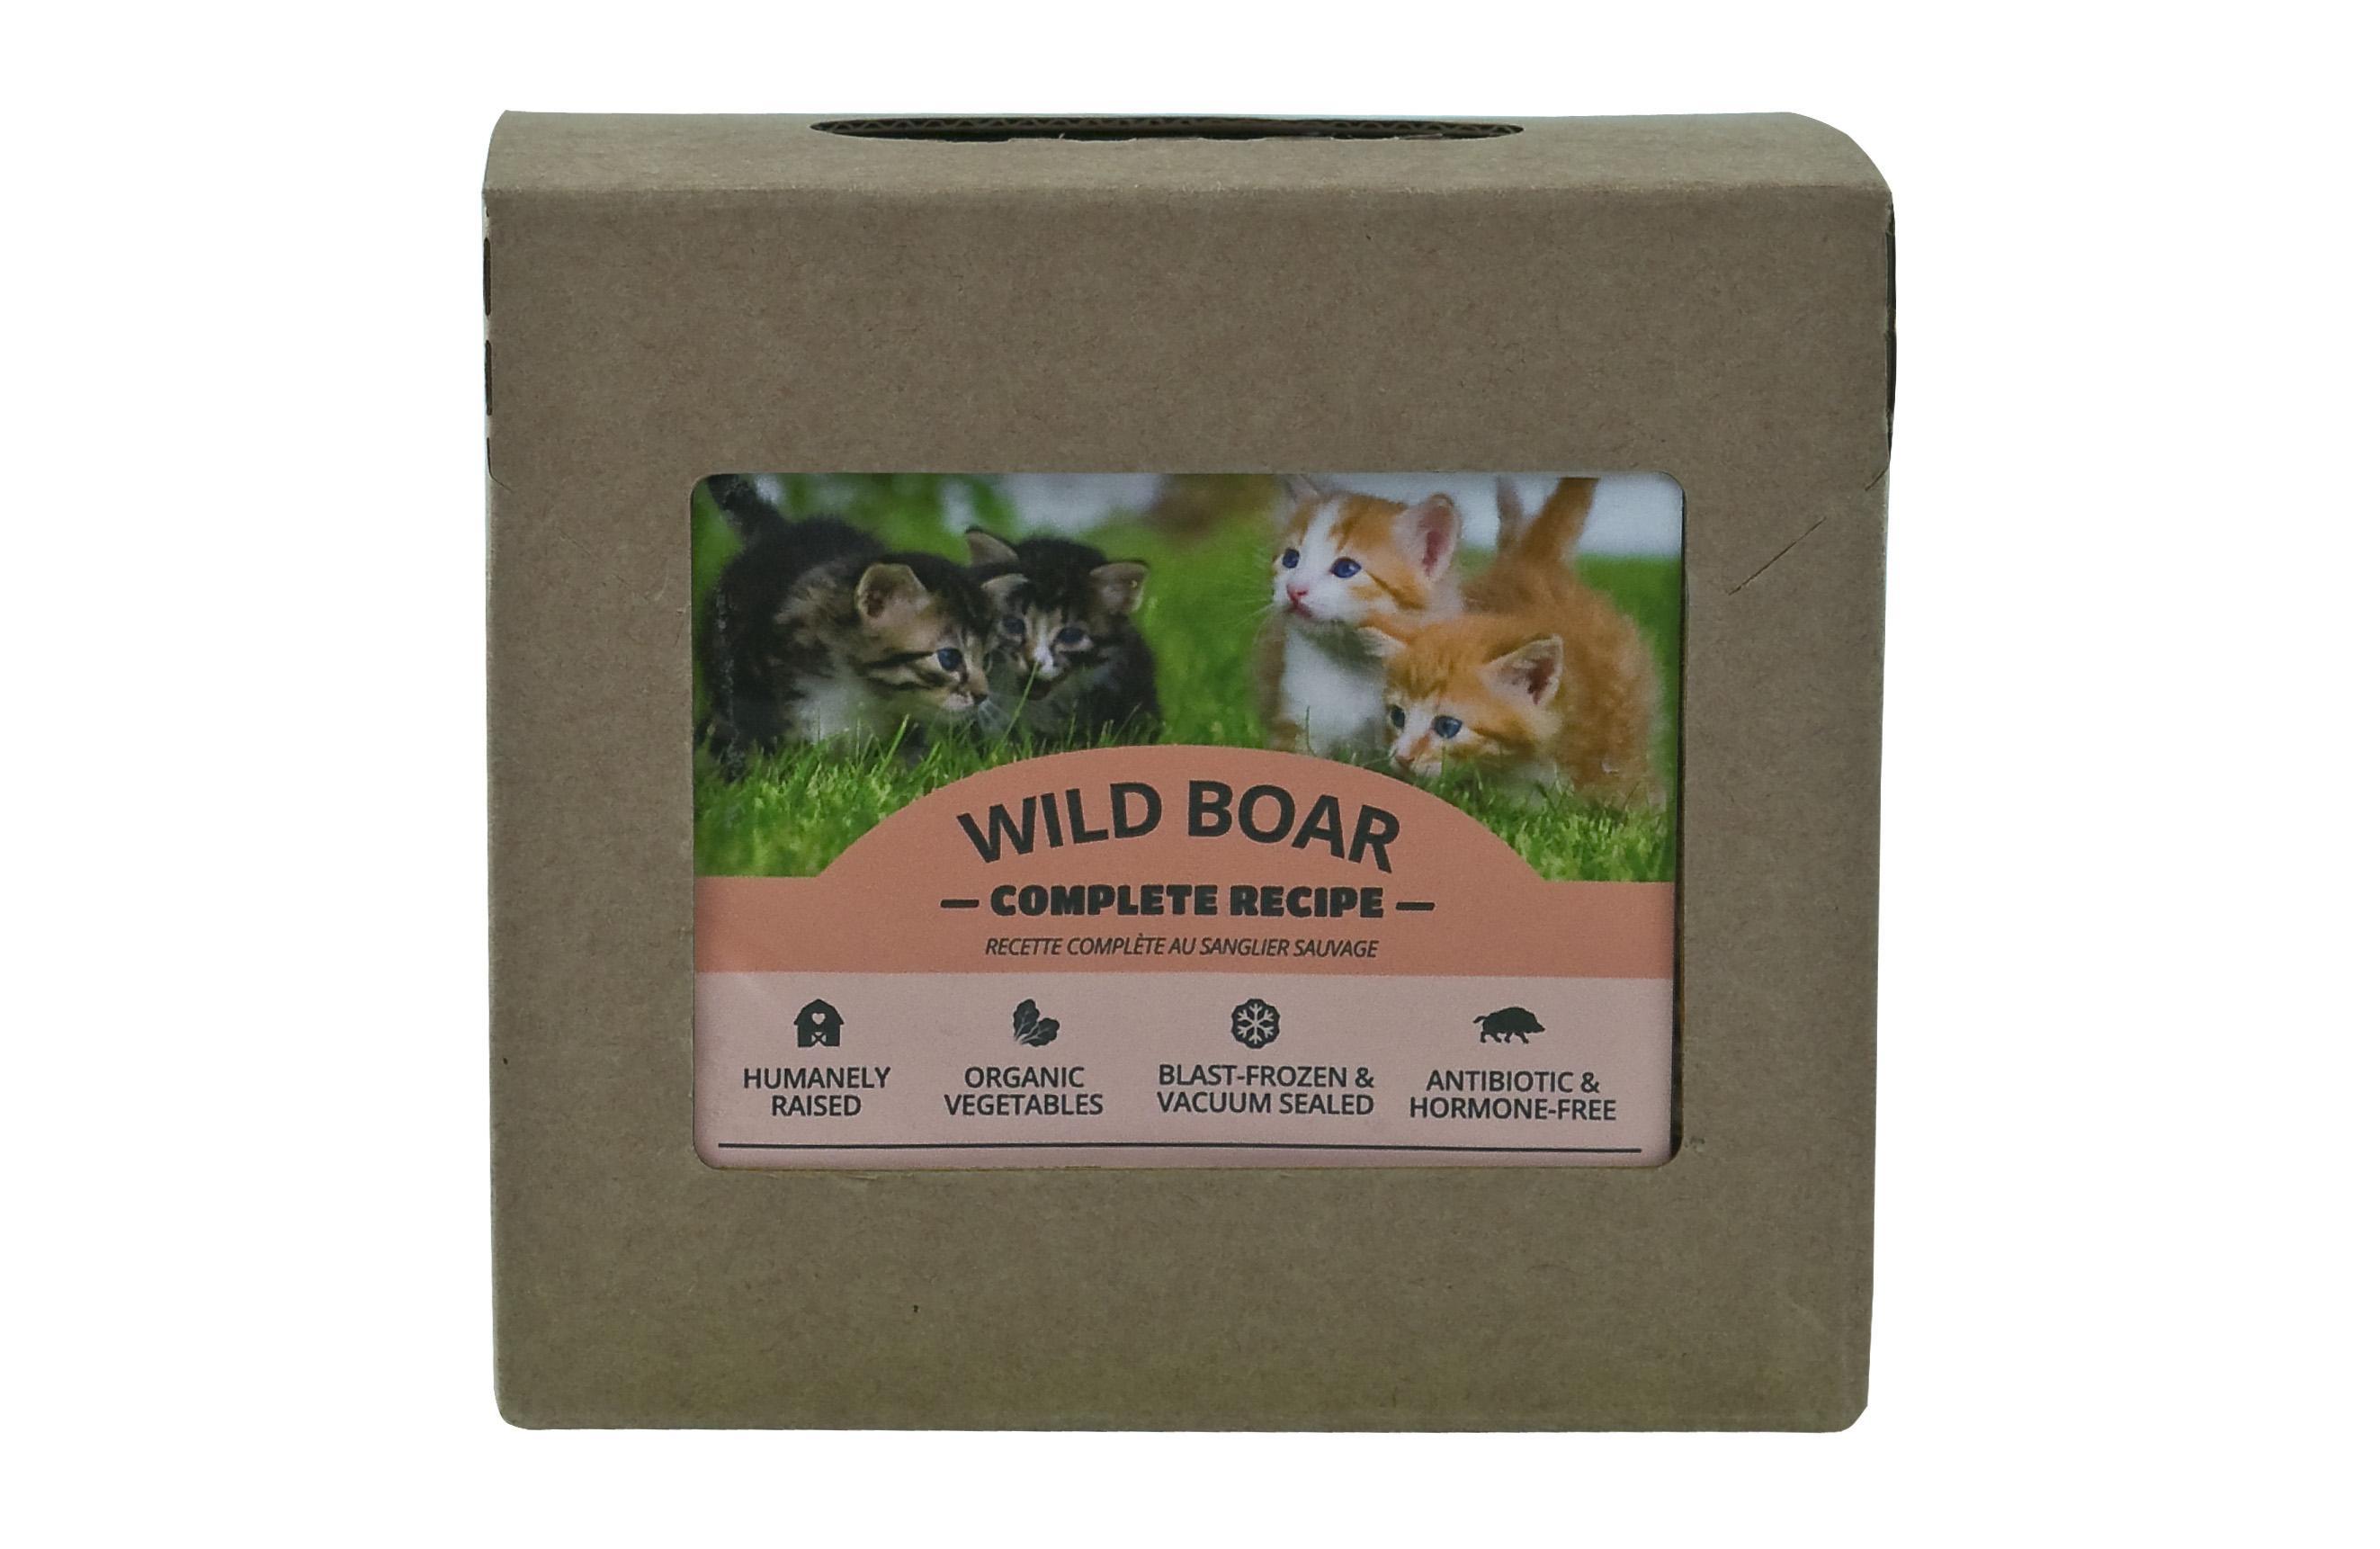 Red Dog Blue Kat Wild Boar Complete Recipe Frozen Cat Food, 1/4-lb